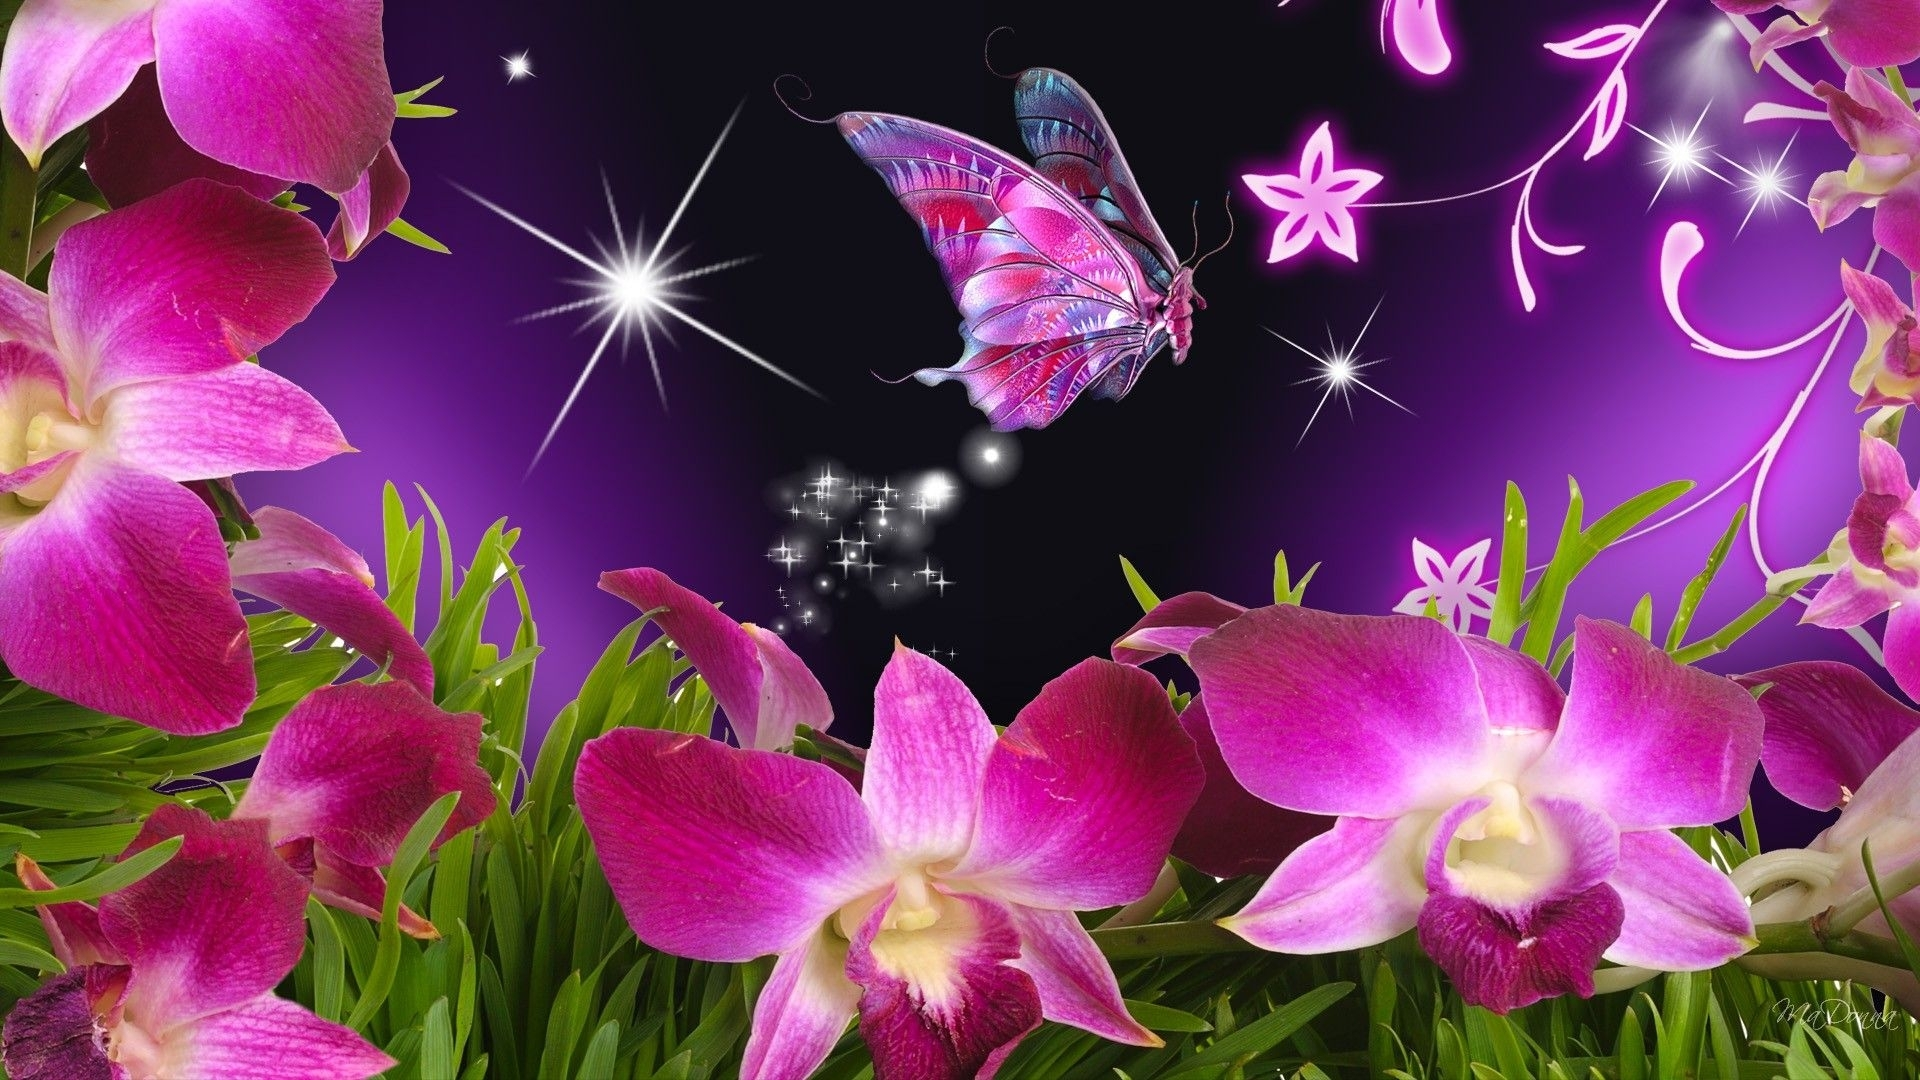 butterflies and flowers | butterfly flowers orchid purple stars